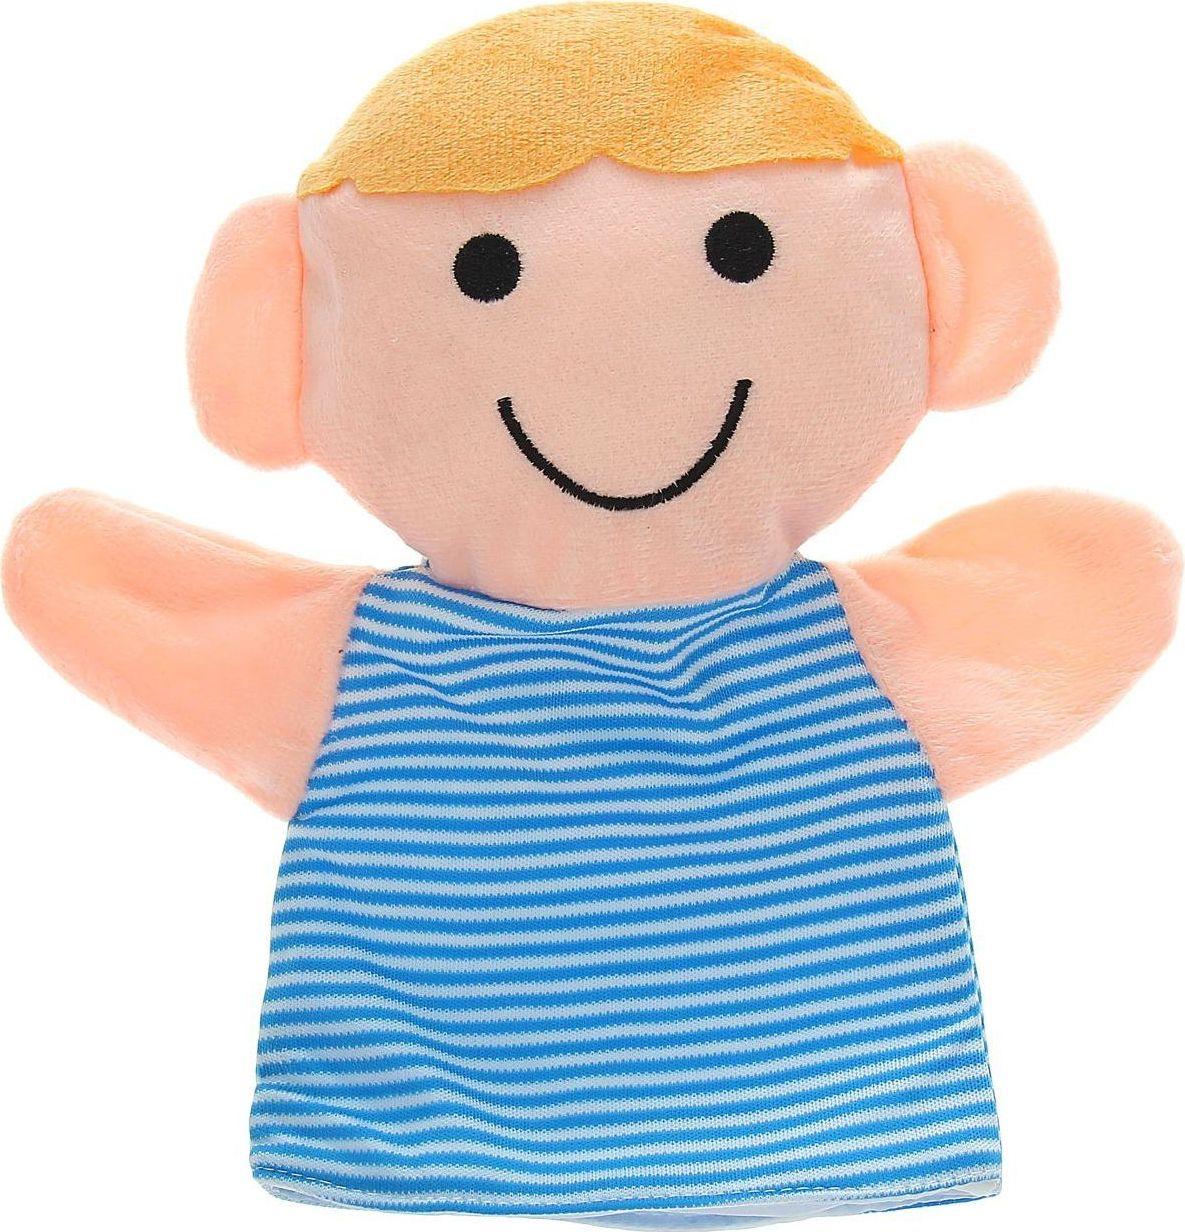 Sima-land Мягкая игрушка на руку Мальчик 1147835, Сима-ленд